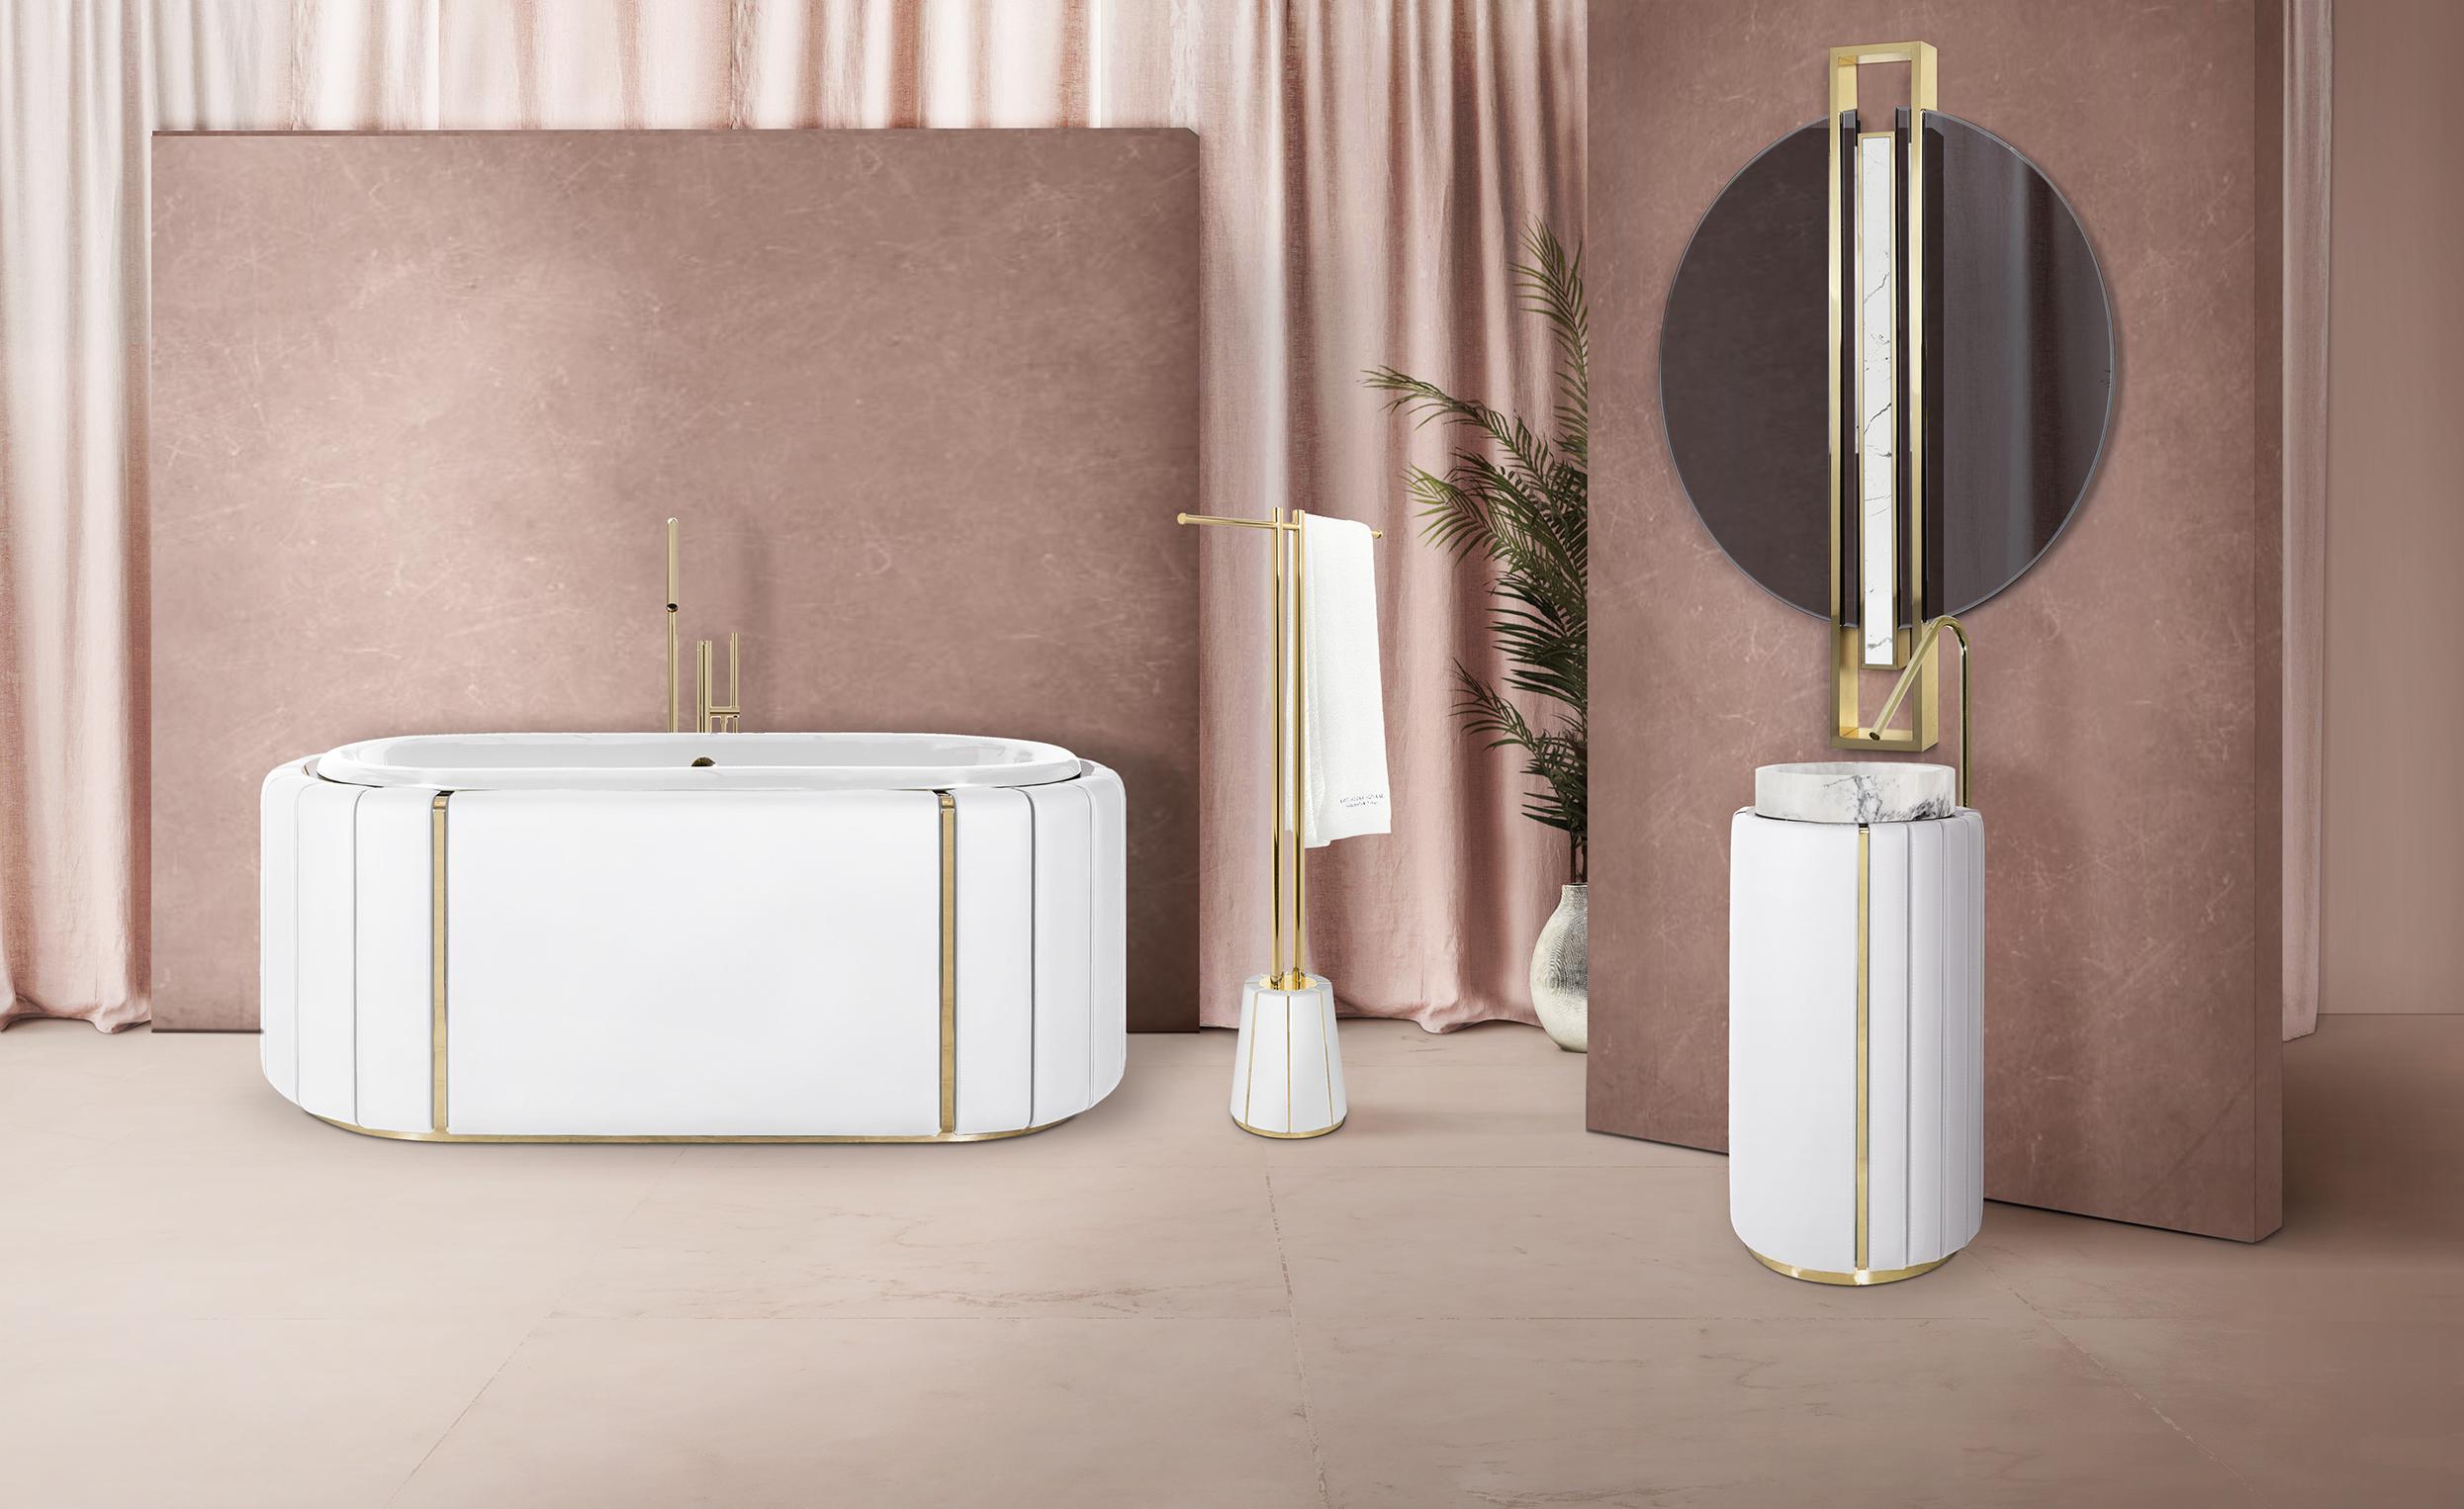 bathroom Fancy Bathroom Designs charming bathroom with white darian towel rack and white darian freestanding